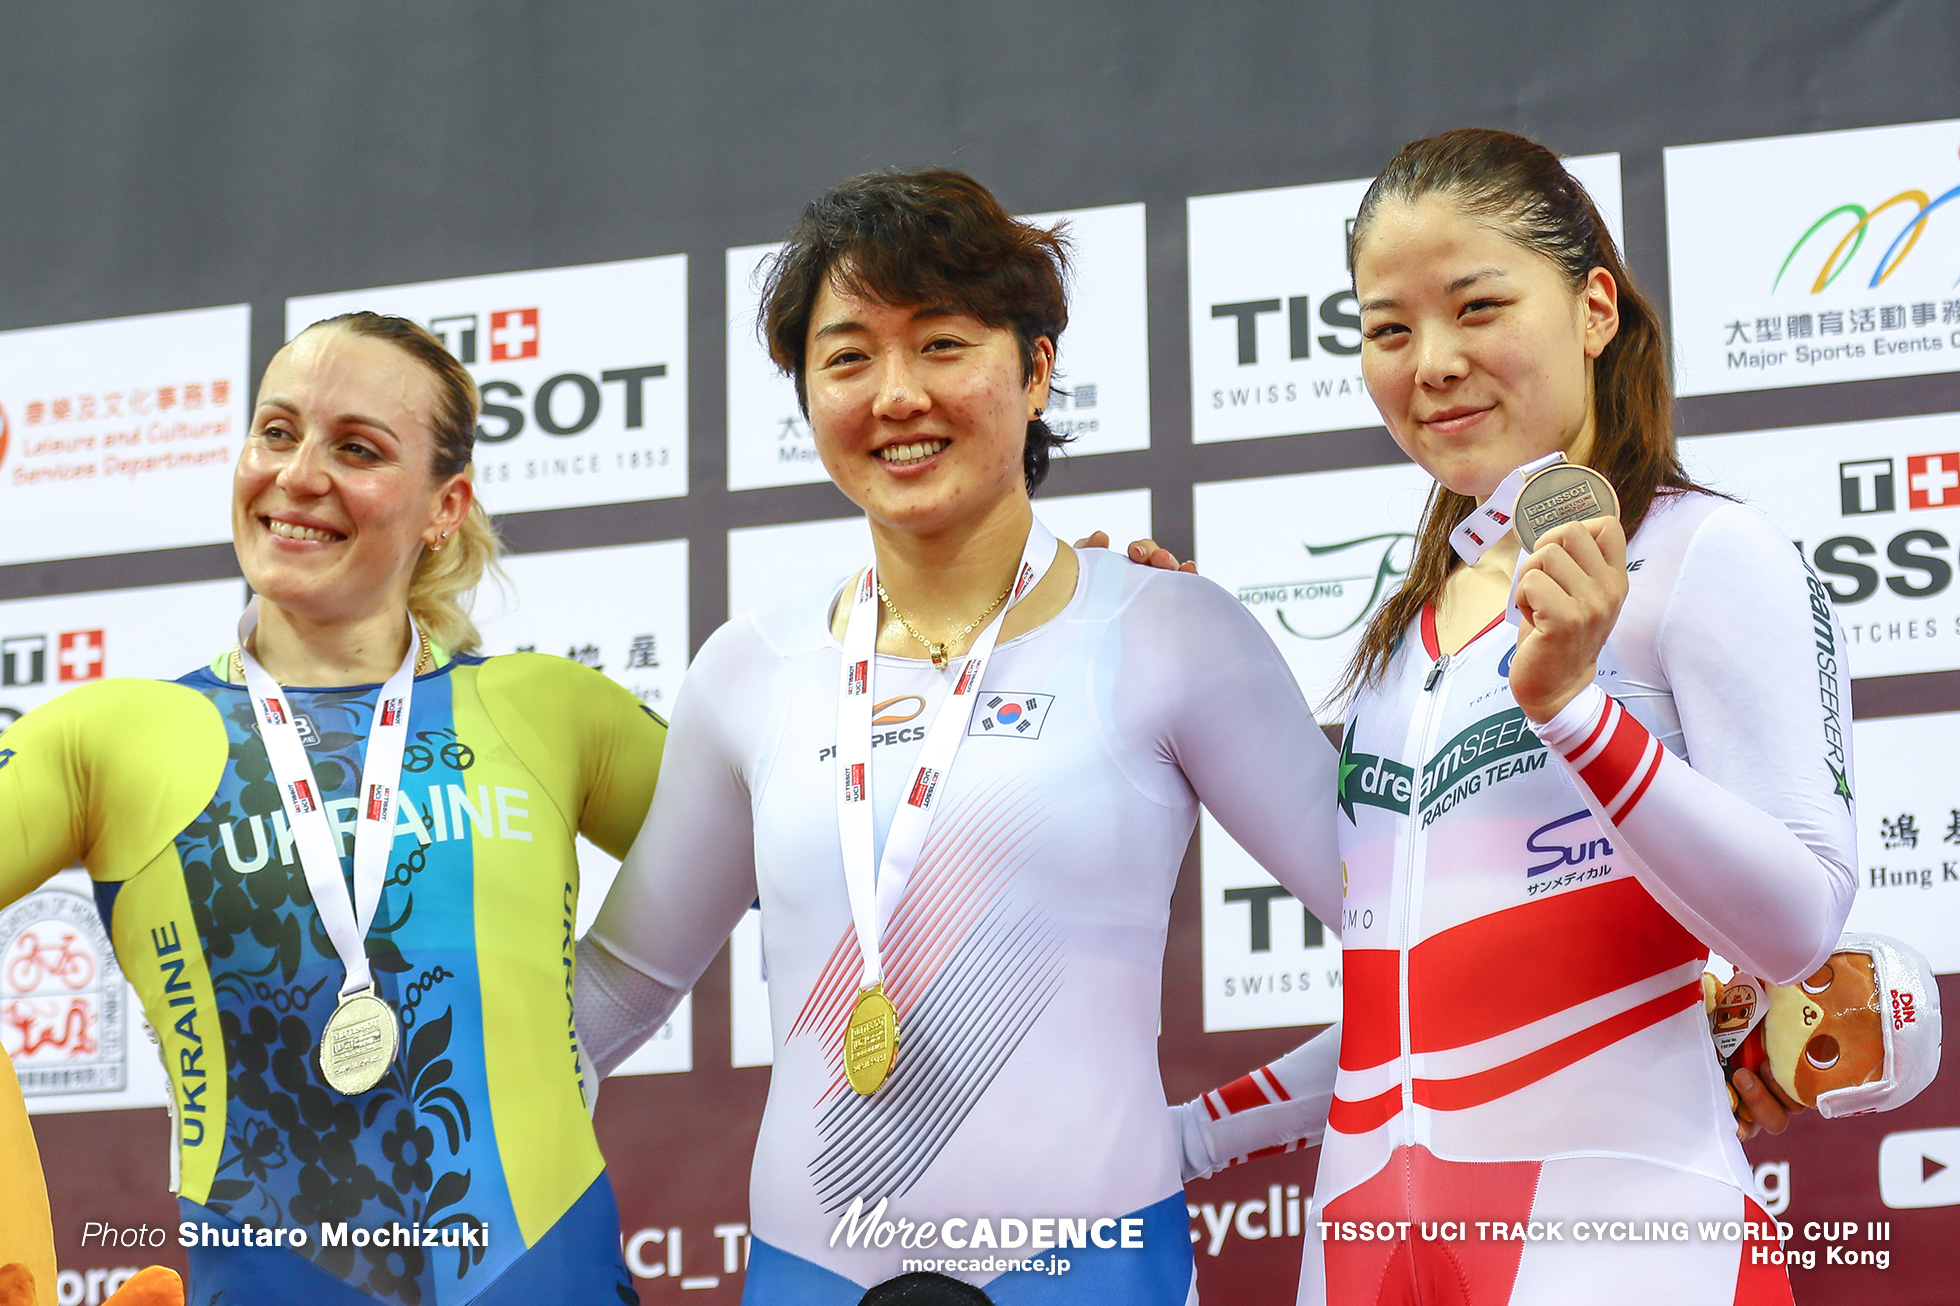 Women's Keirin / TISSOT UCI TRACK CYCLING WORLD CUP III, Hong Kong, LEE Hyejin イ・ヘジン Liubov BASOVA リウボヴ・バソワ 小林優香